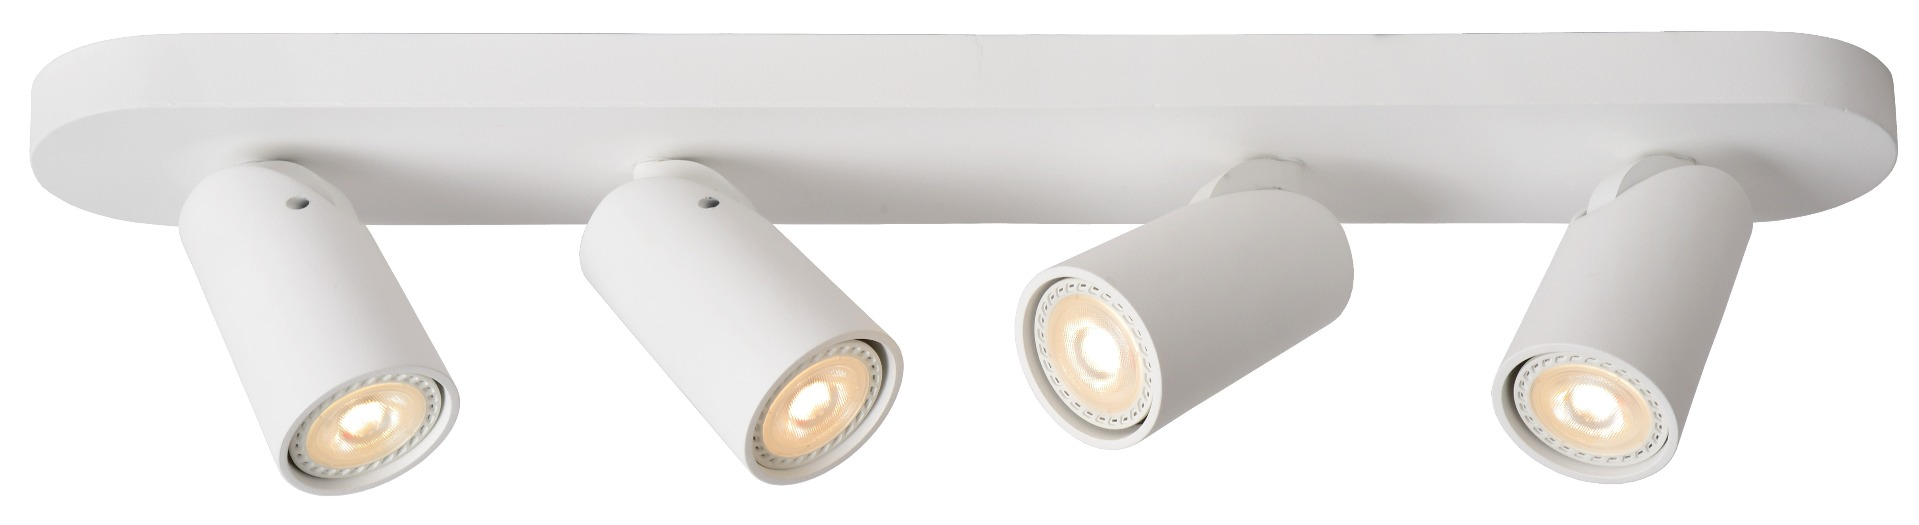 Lucide SALE - Plafondspot Xyrus 4 Lichts - Dimbare LED - Wit